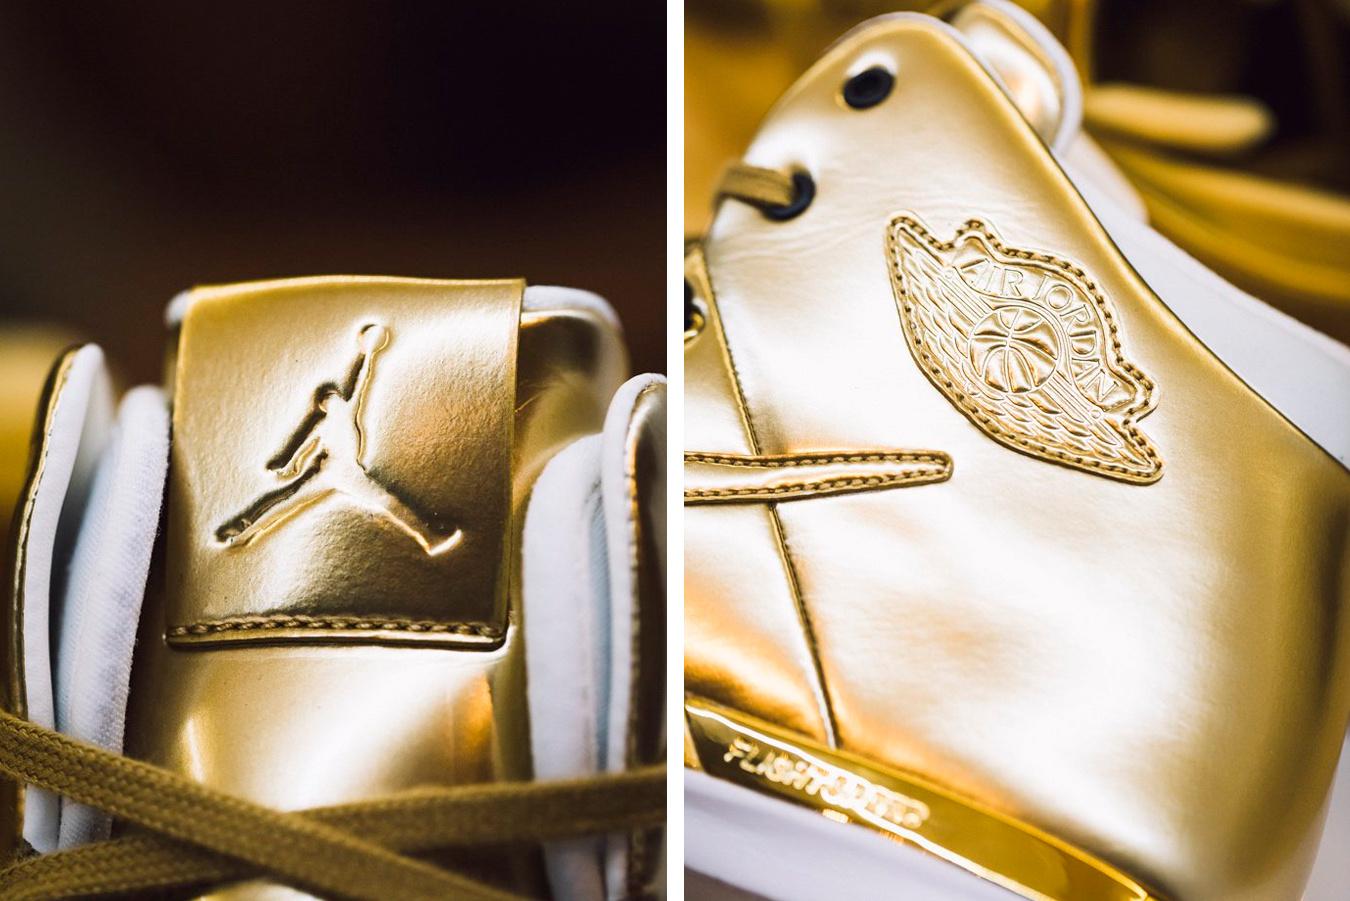 The Air Jordan 31 Gold